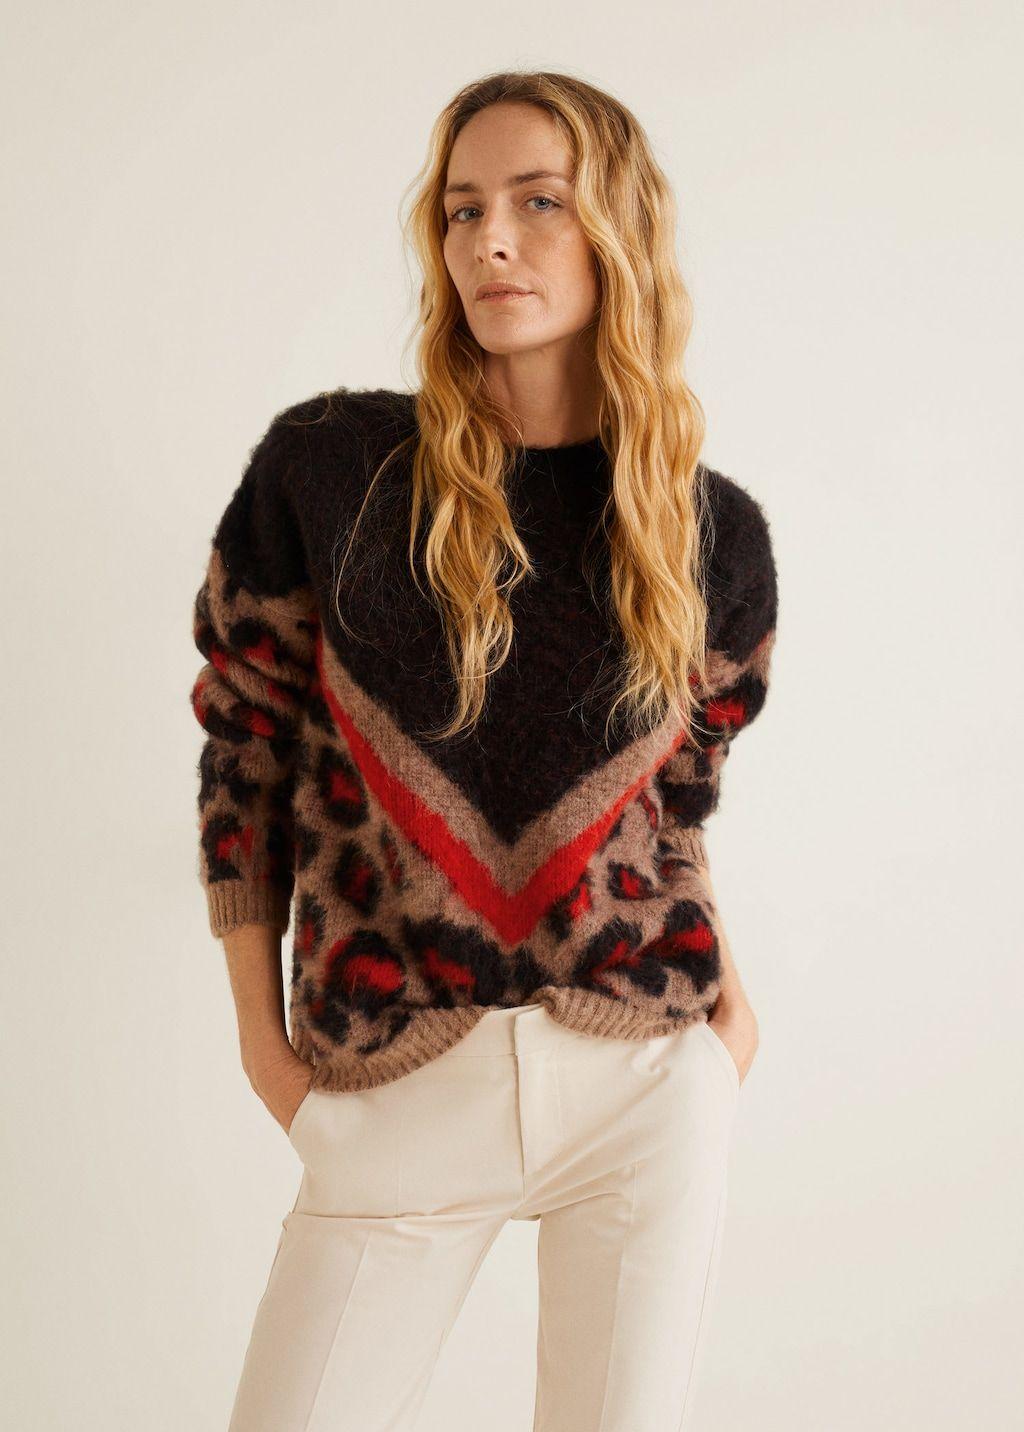 BROWN Leopard print sweater  MSGM  Cardigans